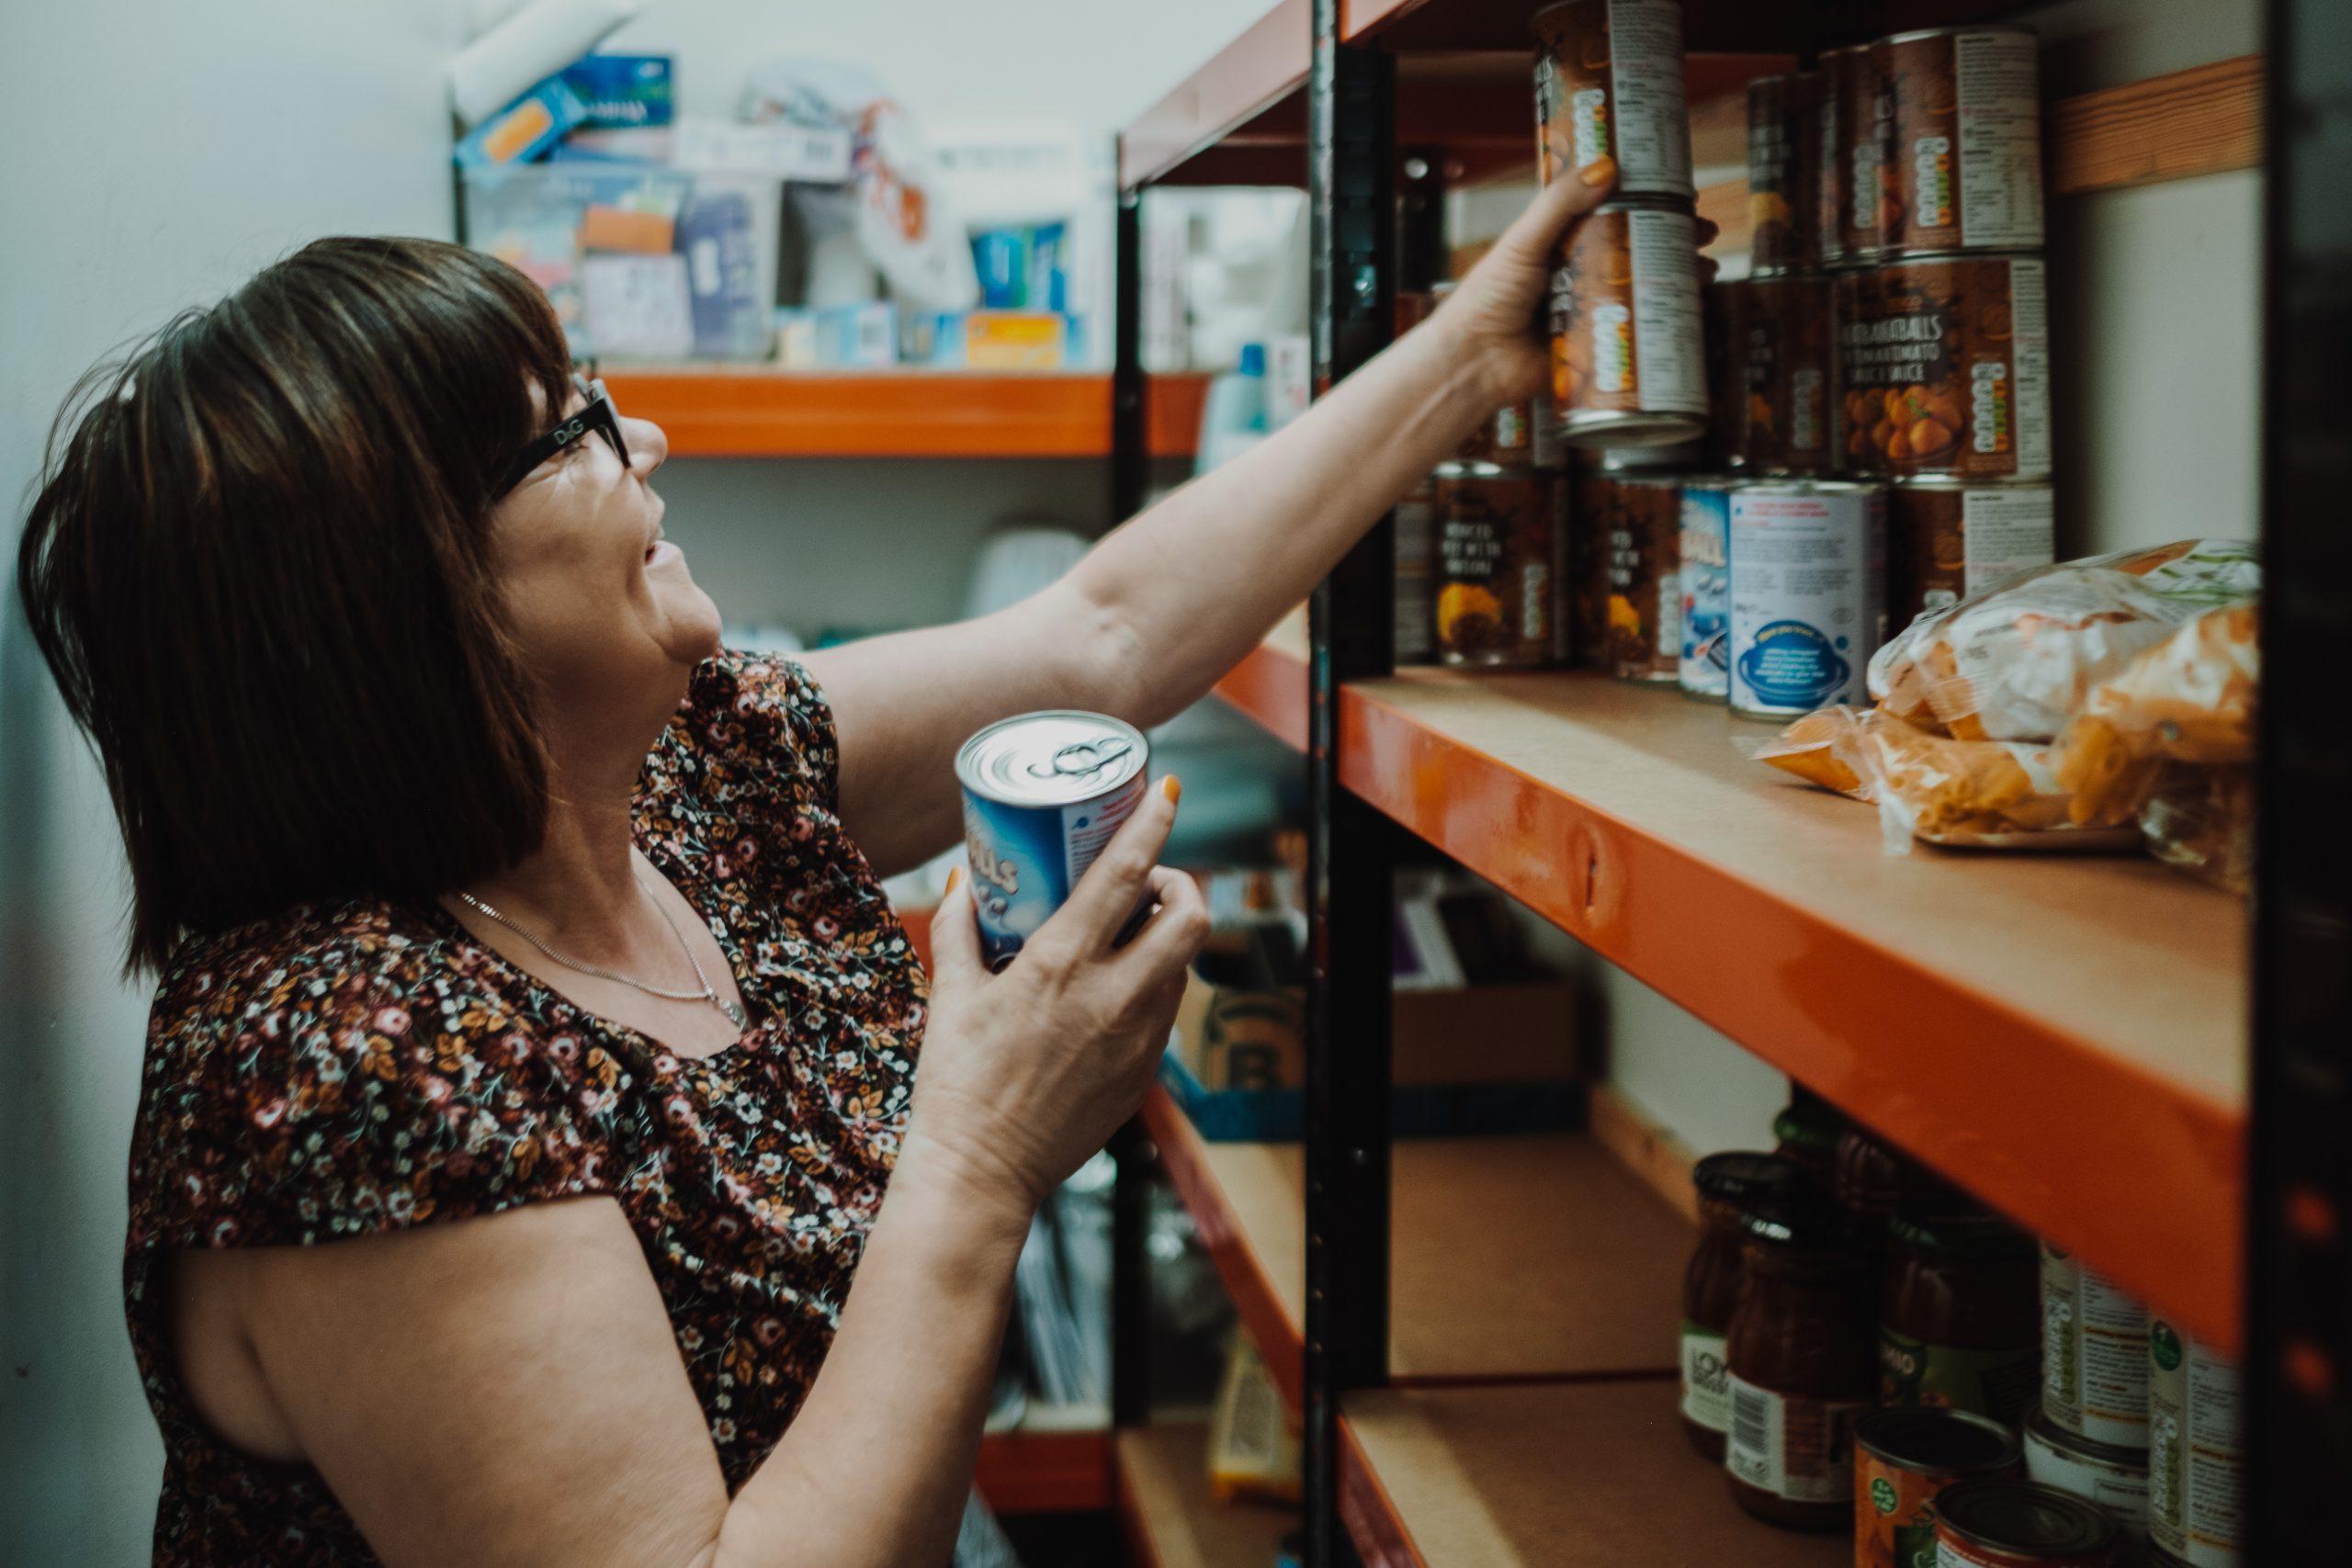 Jane putting tins on a food bank shelf